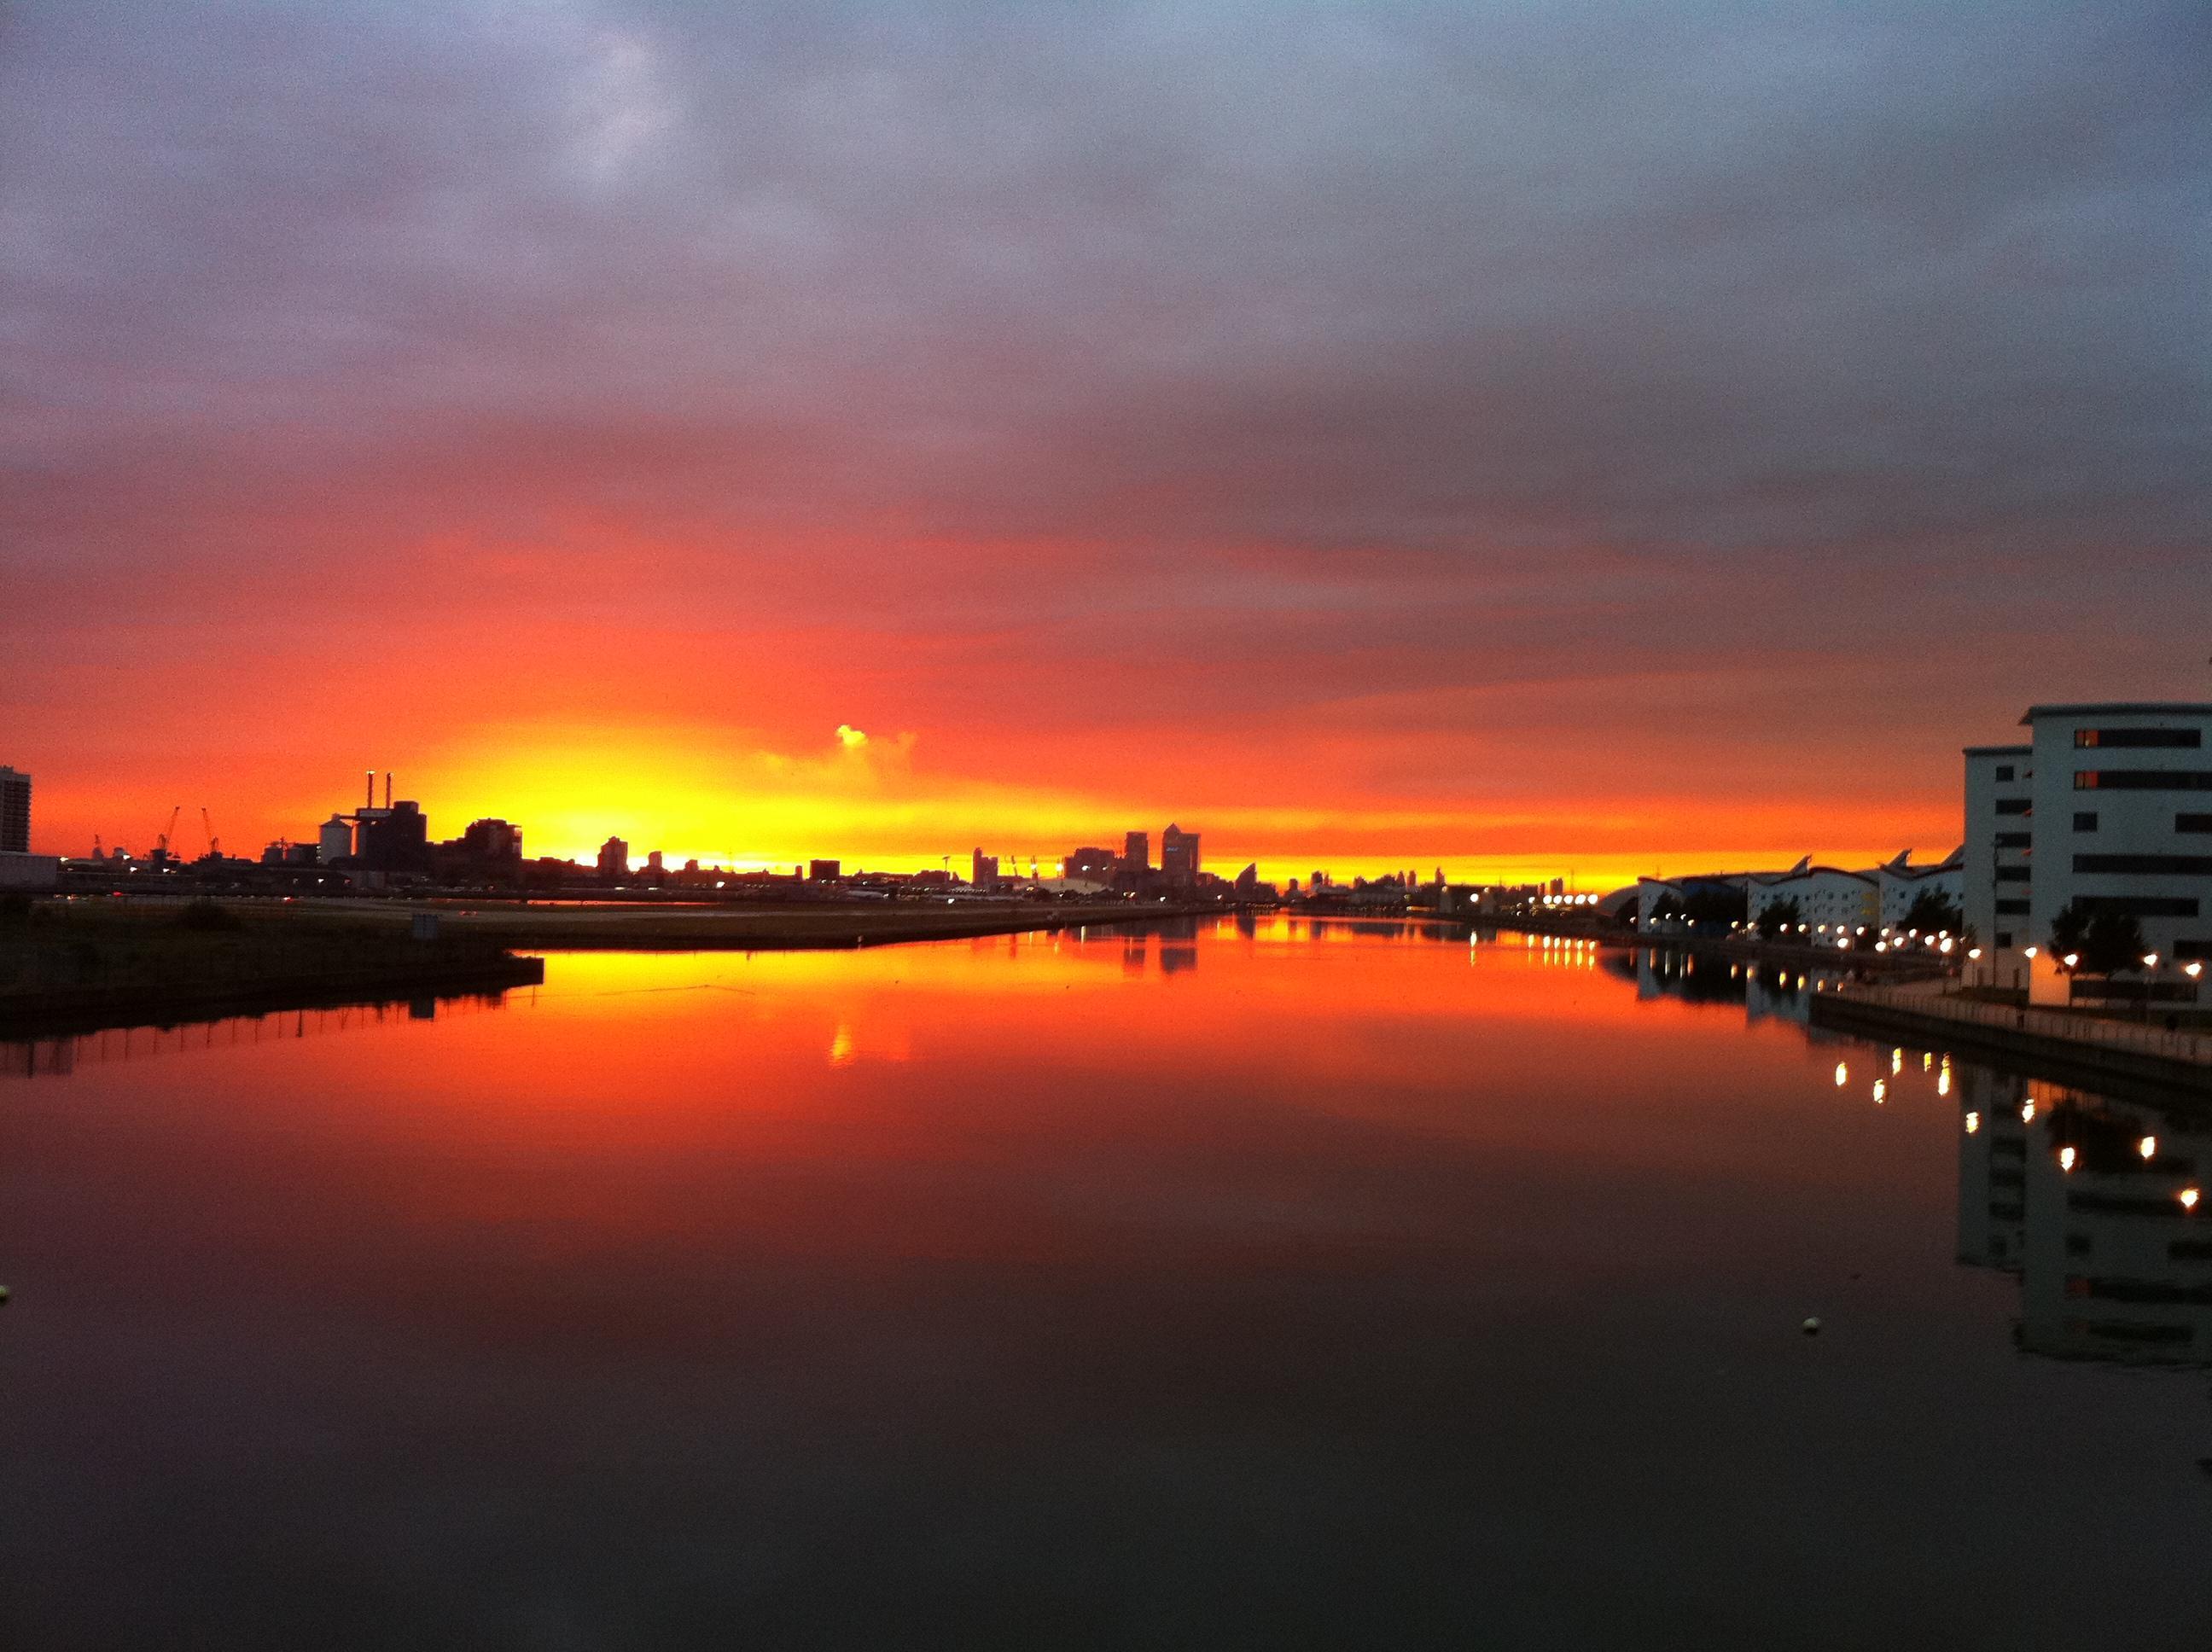 Sunset over the Royal Docks